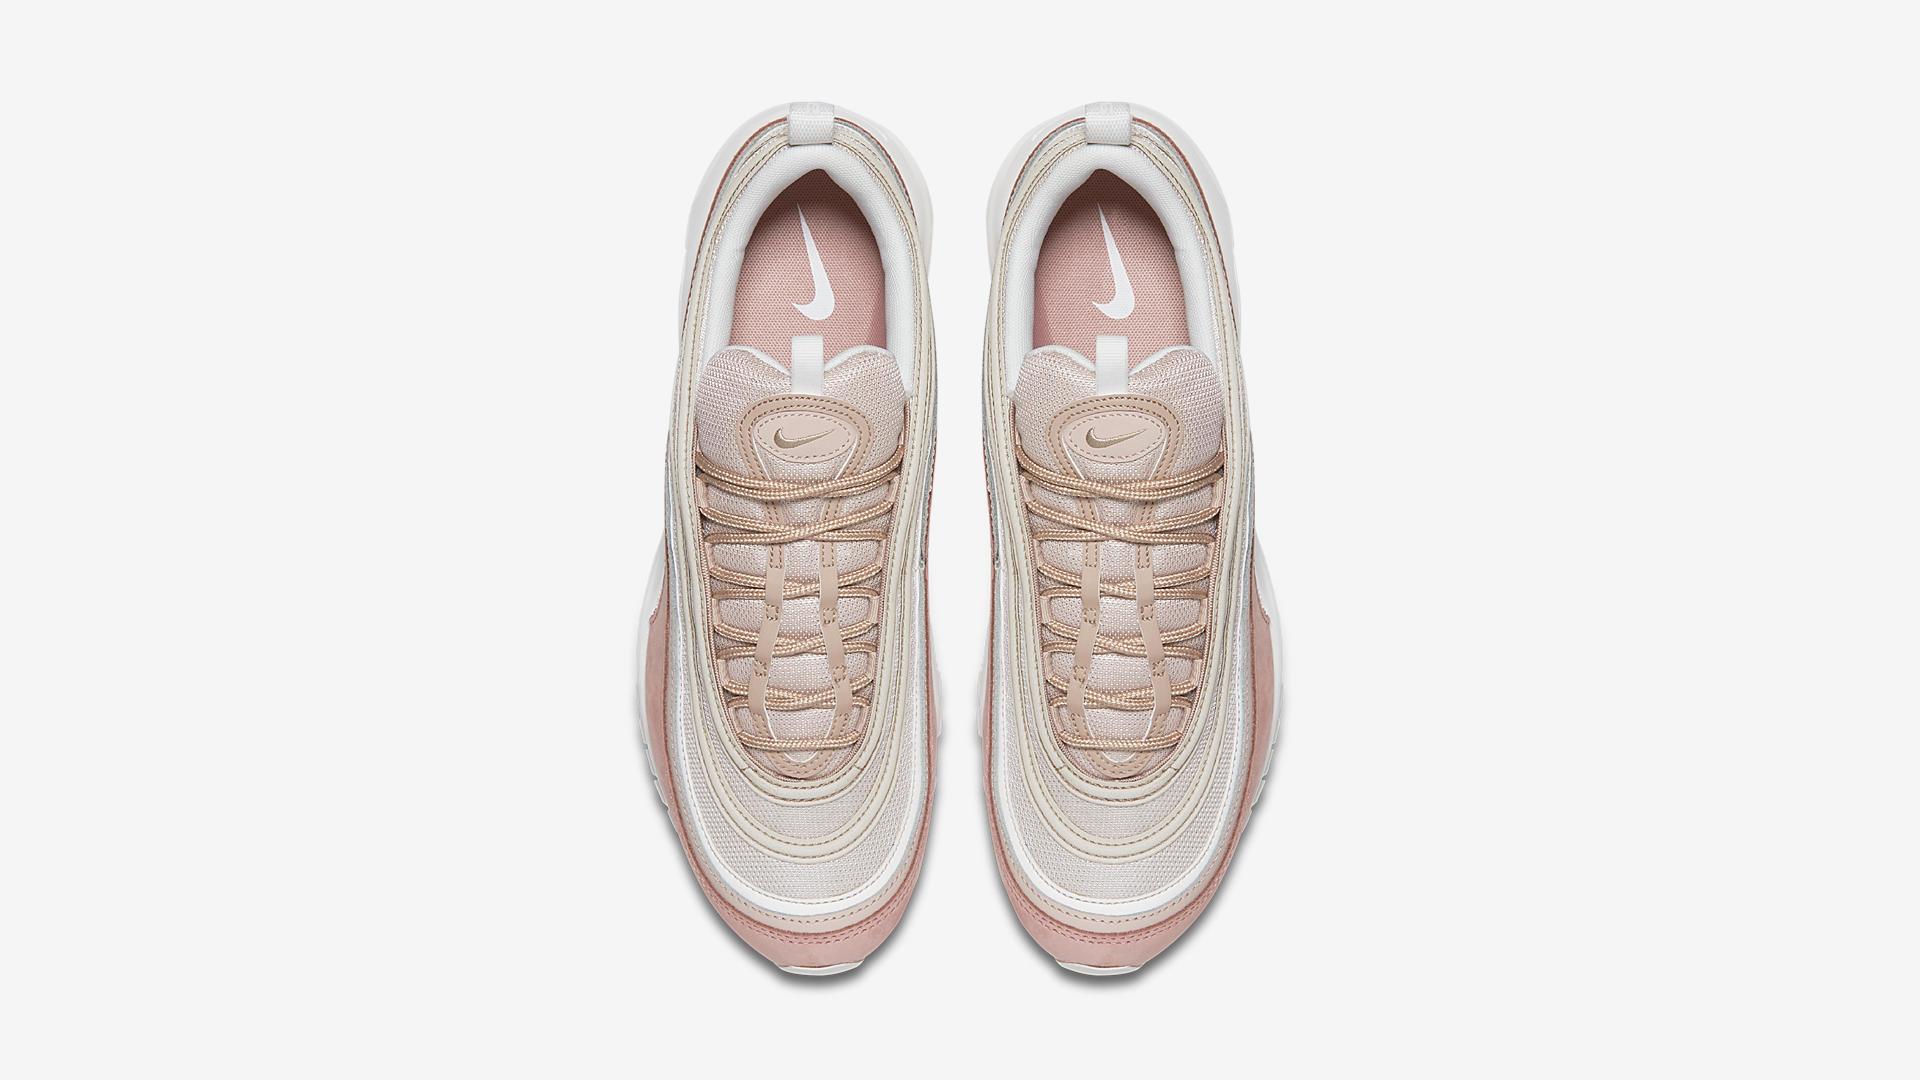 312834 200 Nike Air Max 97 PRM Particle Beige 3